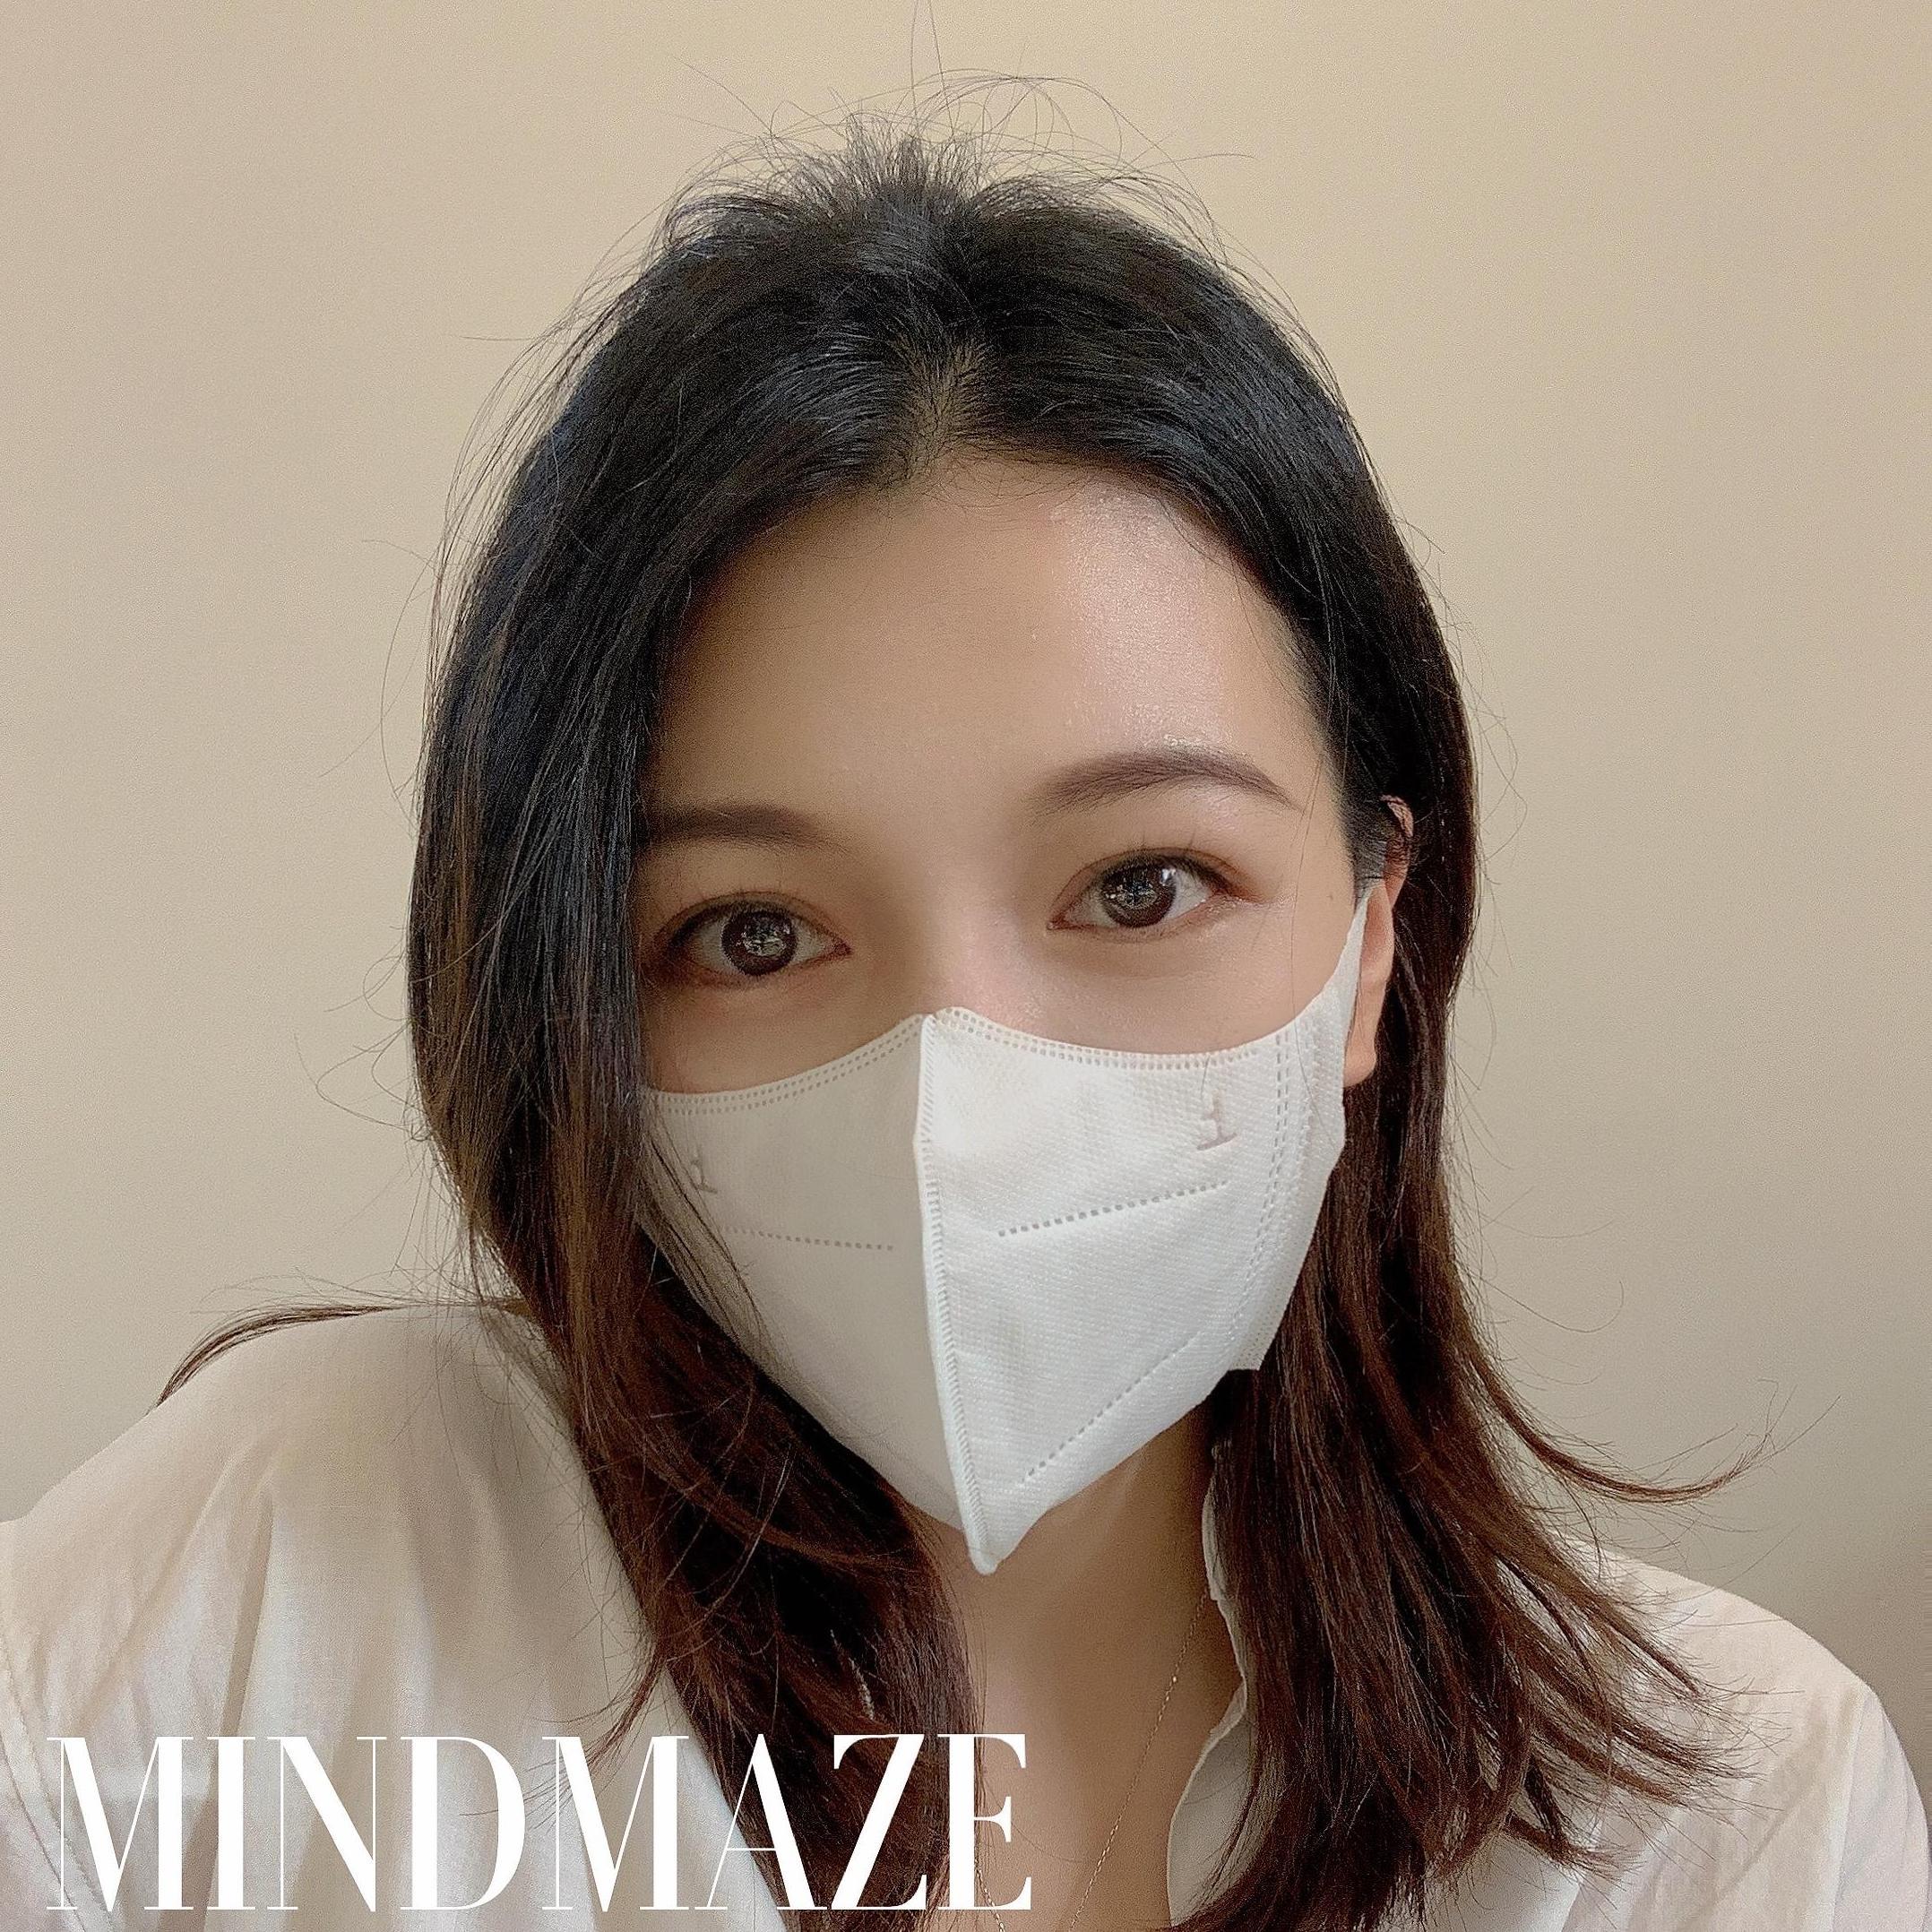 New Breathe smoothly 3d design face mask Light mask(图1)